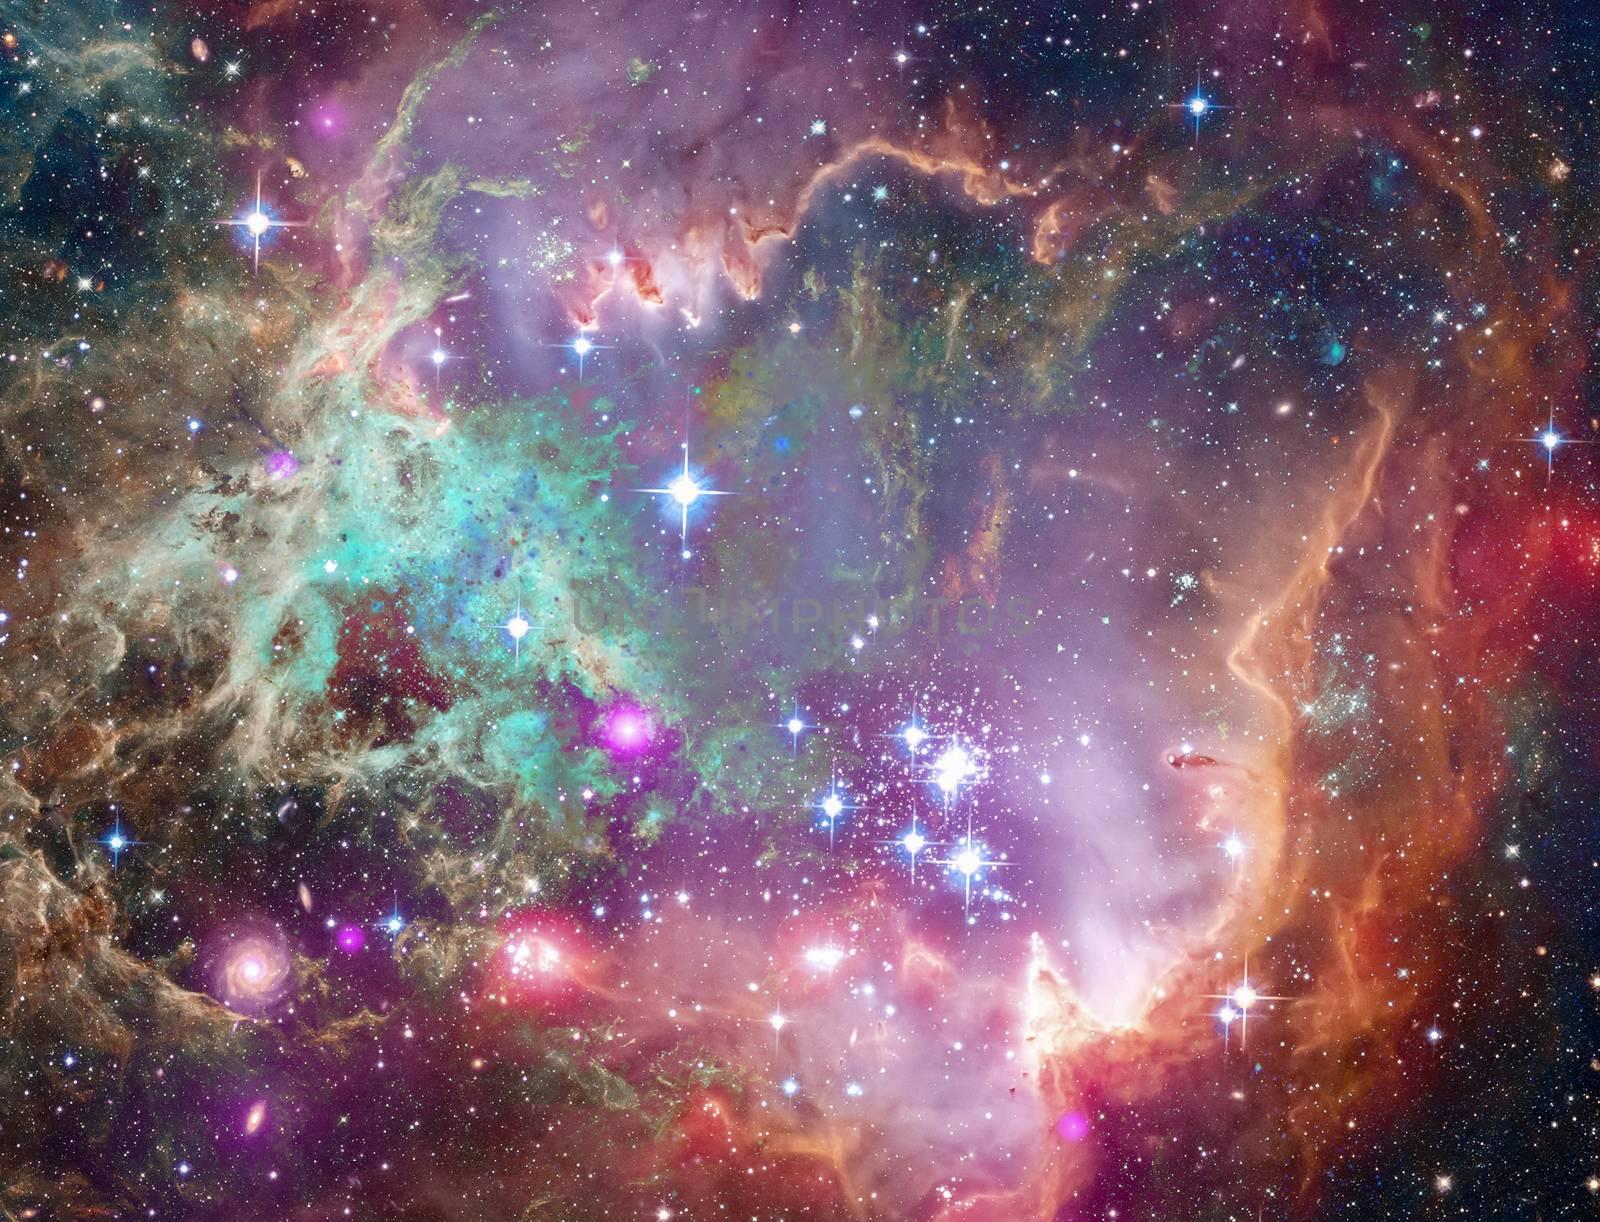 Vivid space. Big Babies in the Rosette Nebula